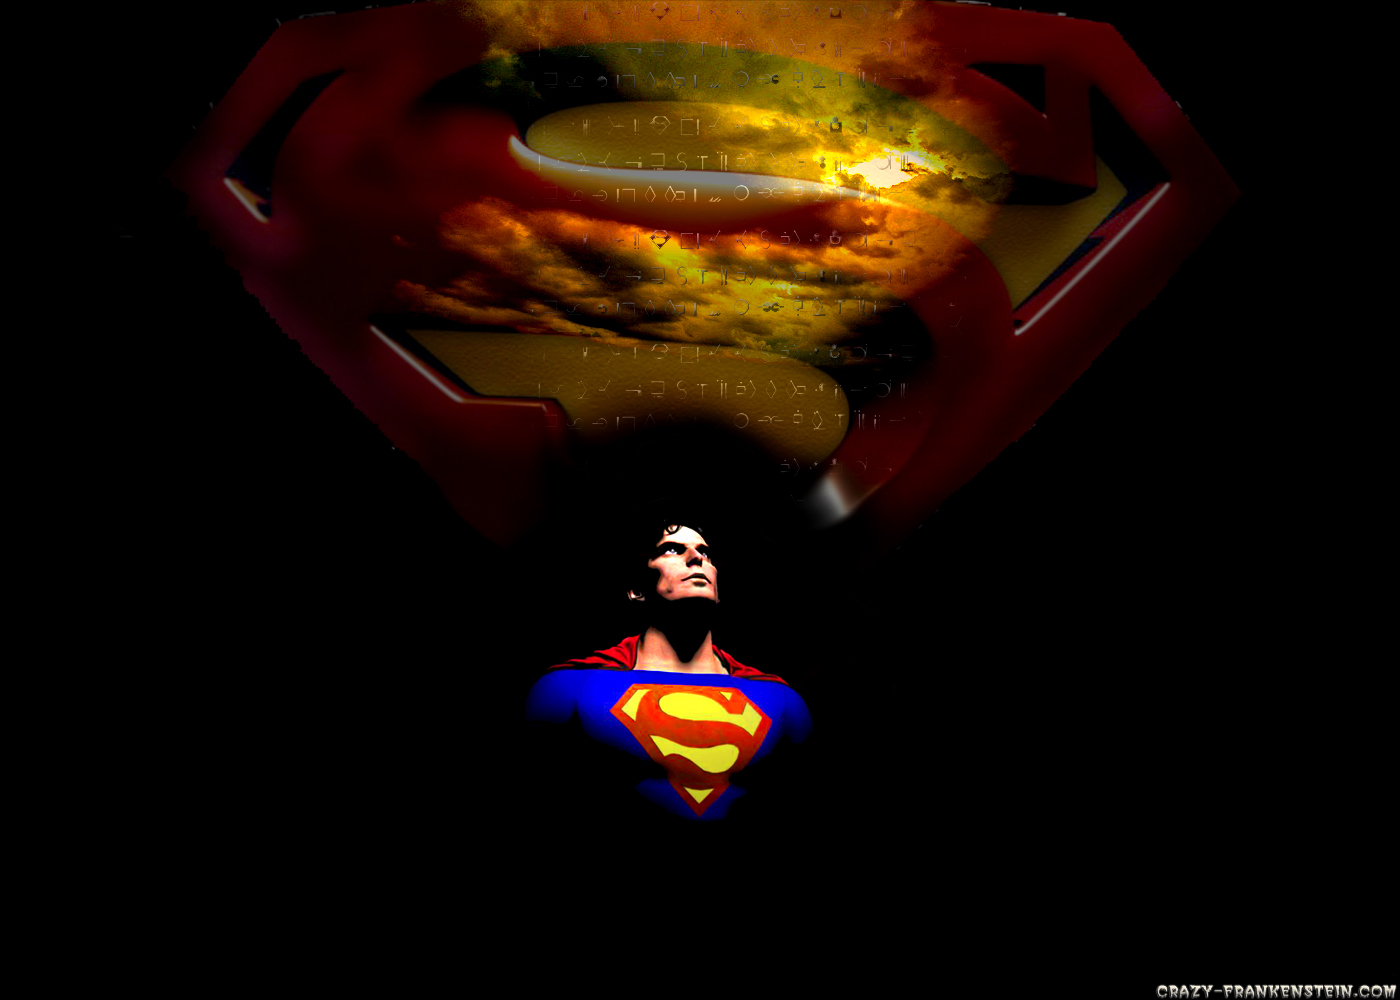 Wallpaper Superman Movie wallpaper 1400x1000